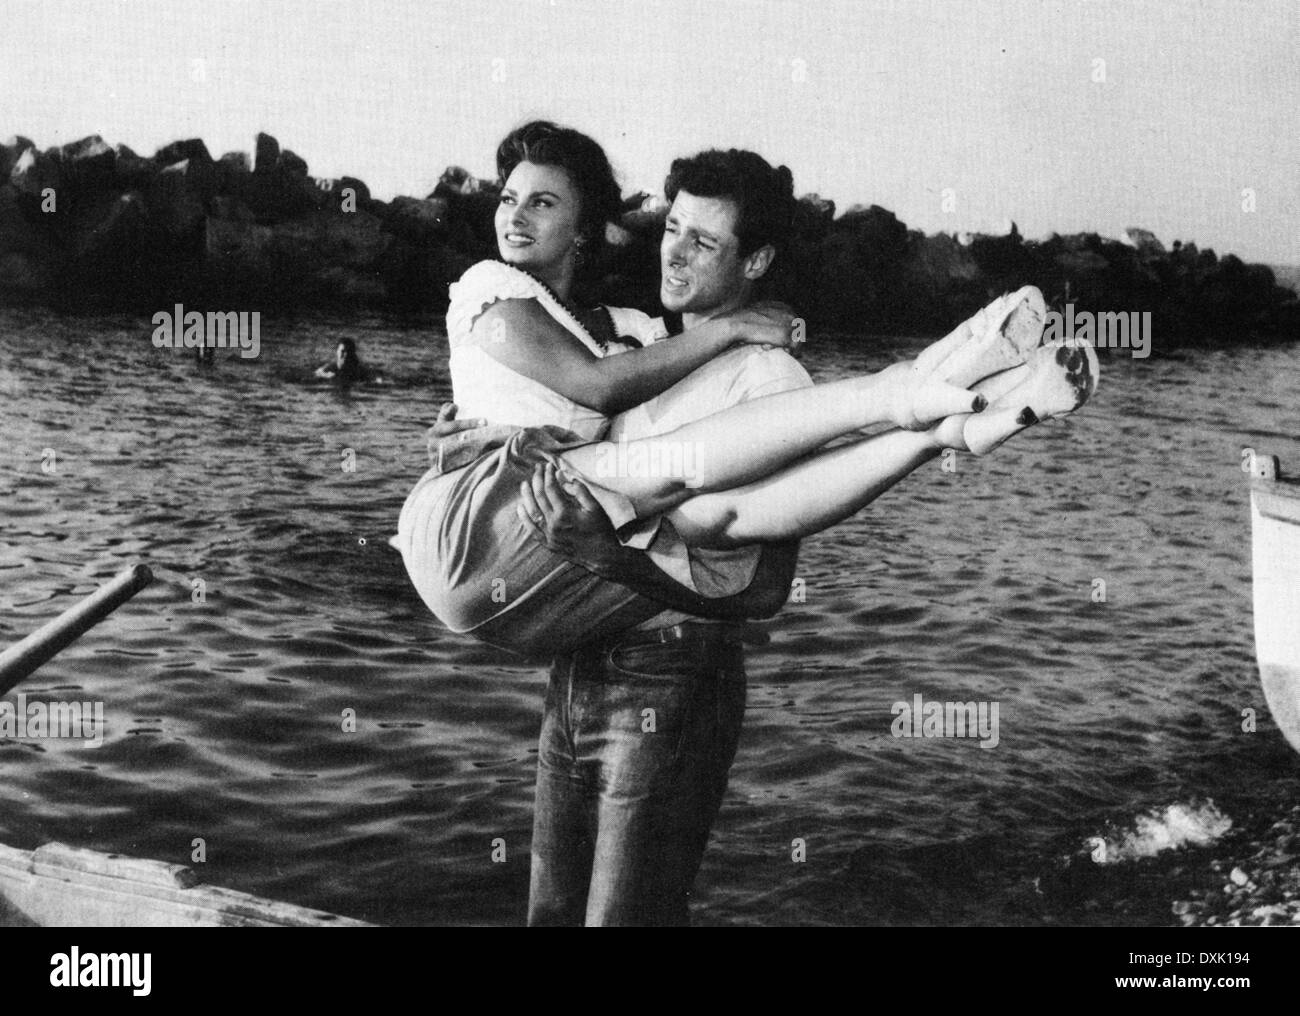 Pane, Amore e... aka Scandal in Sorrento - Stock Image